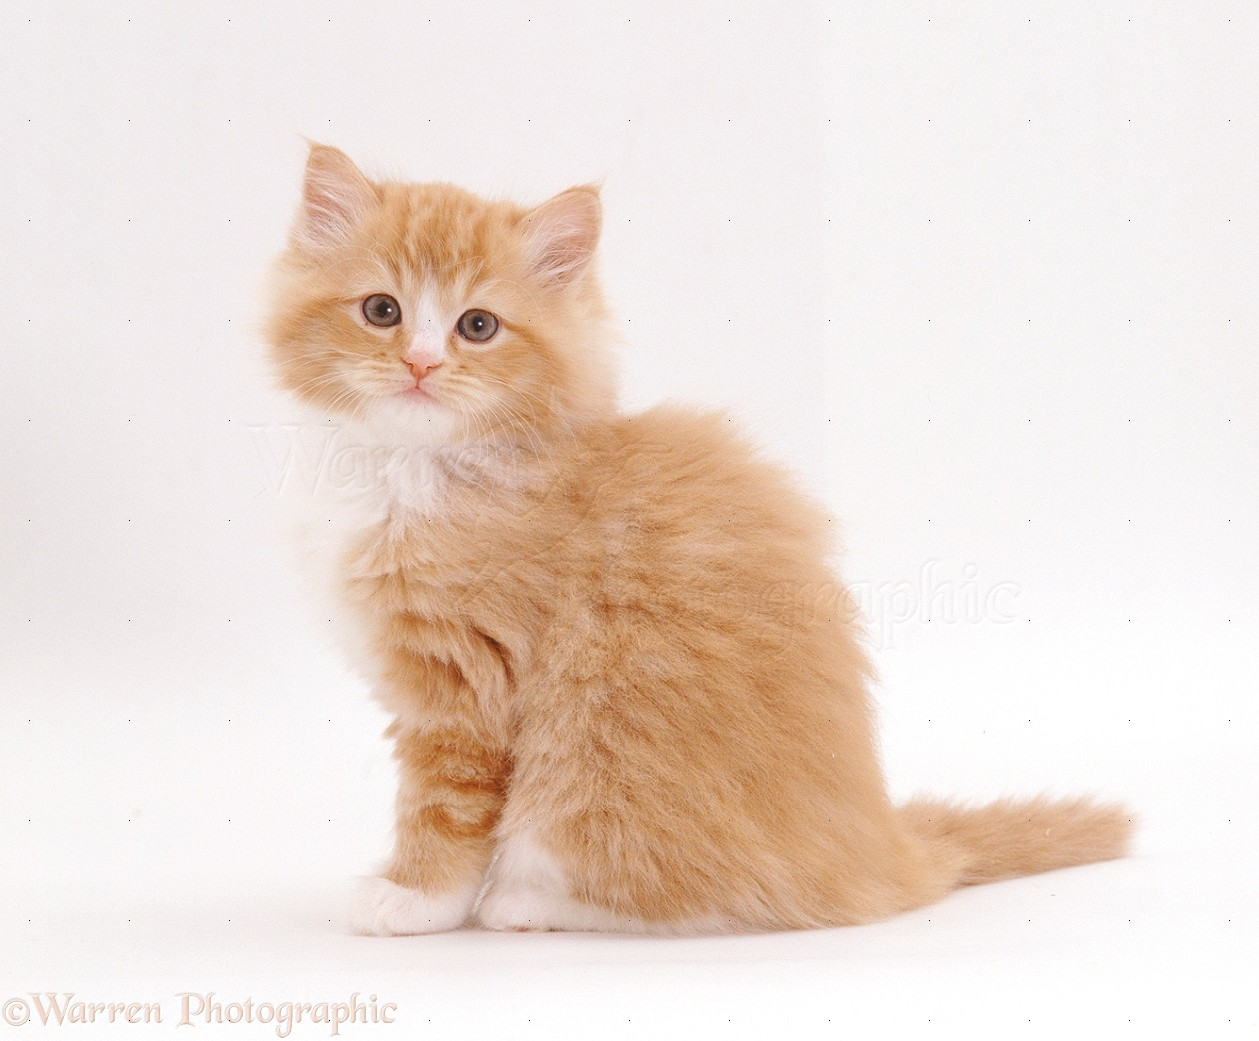 ... Fluffy ginger-and-white female Persian-cross kitten, 8 weeks old